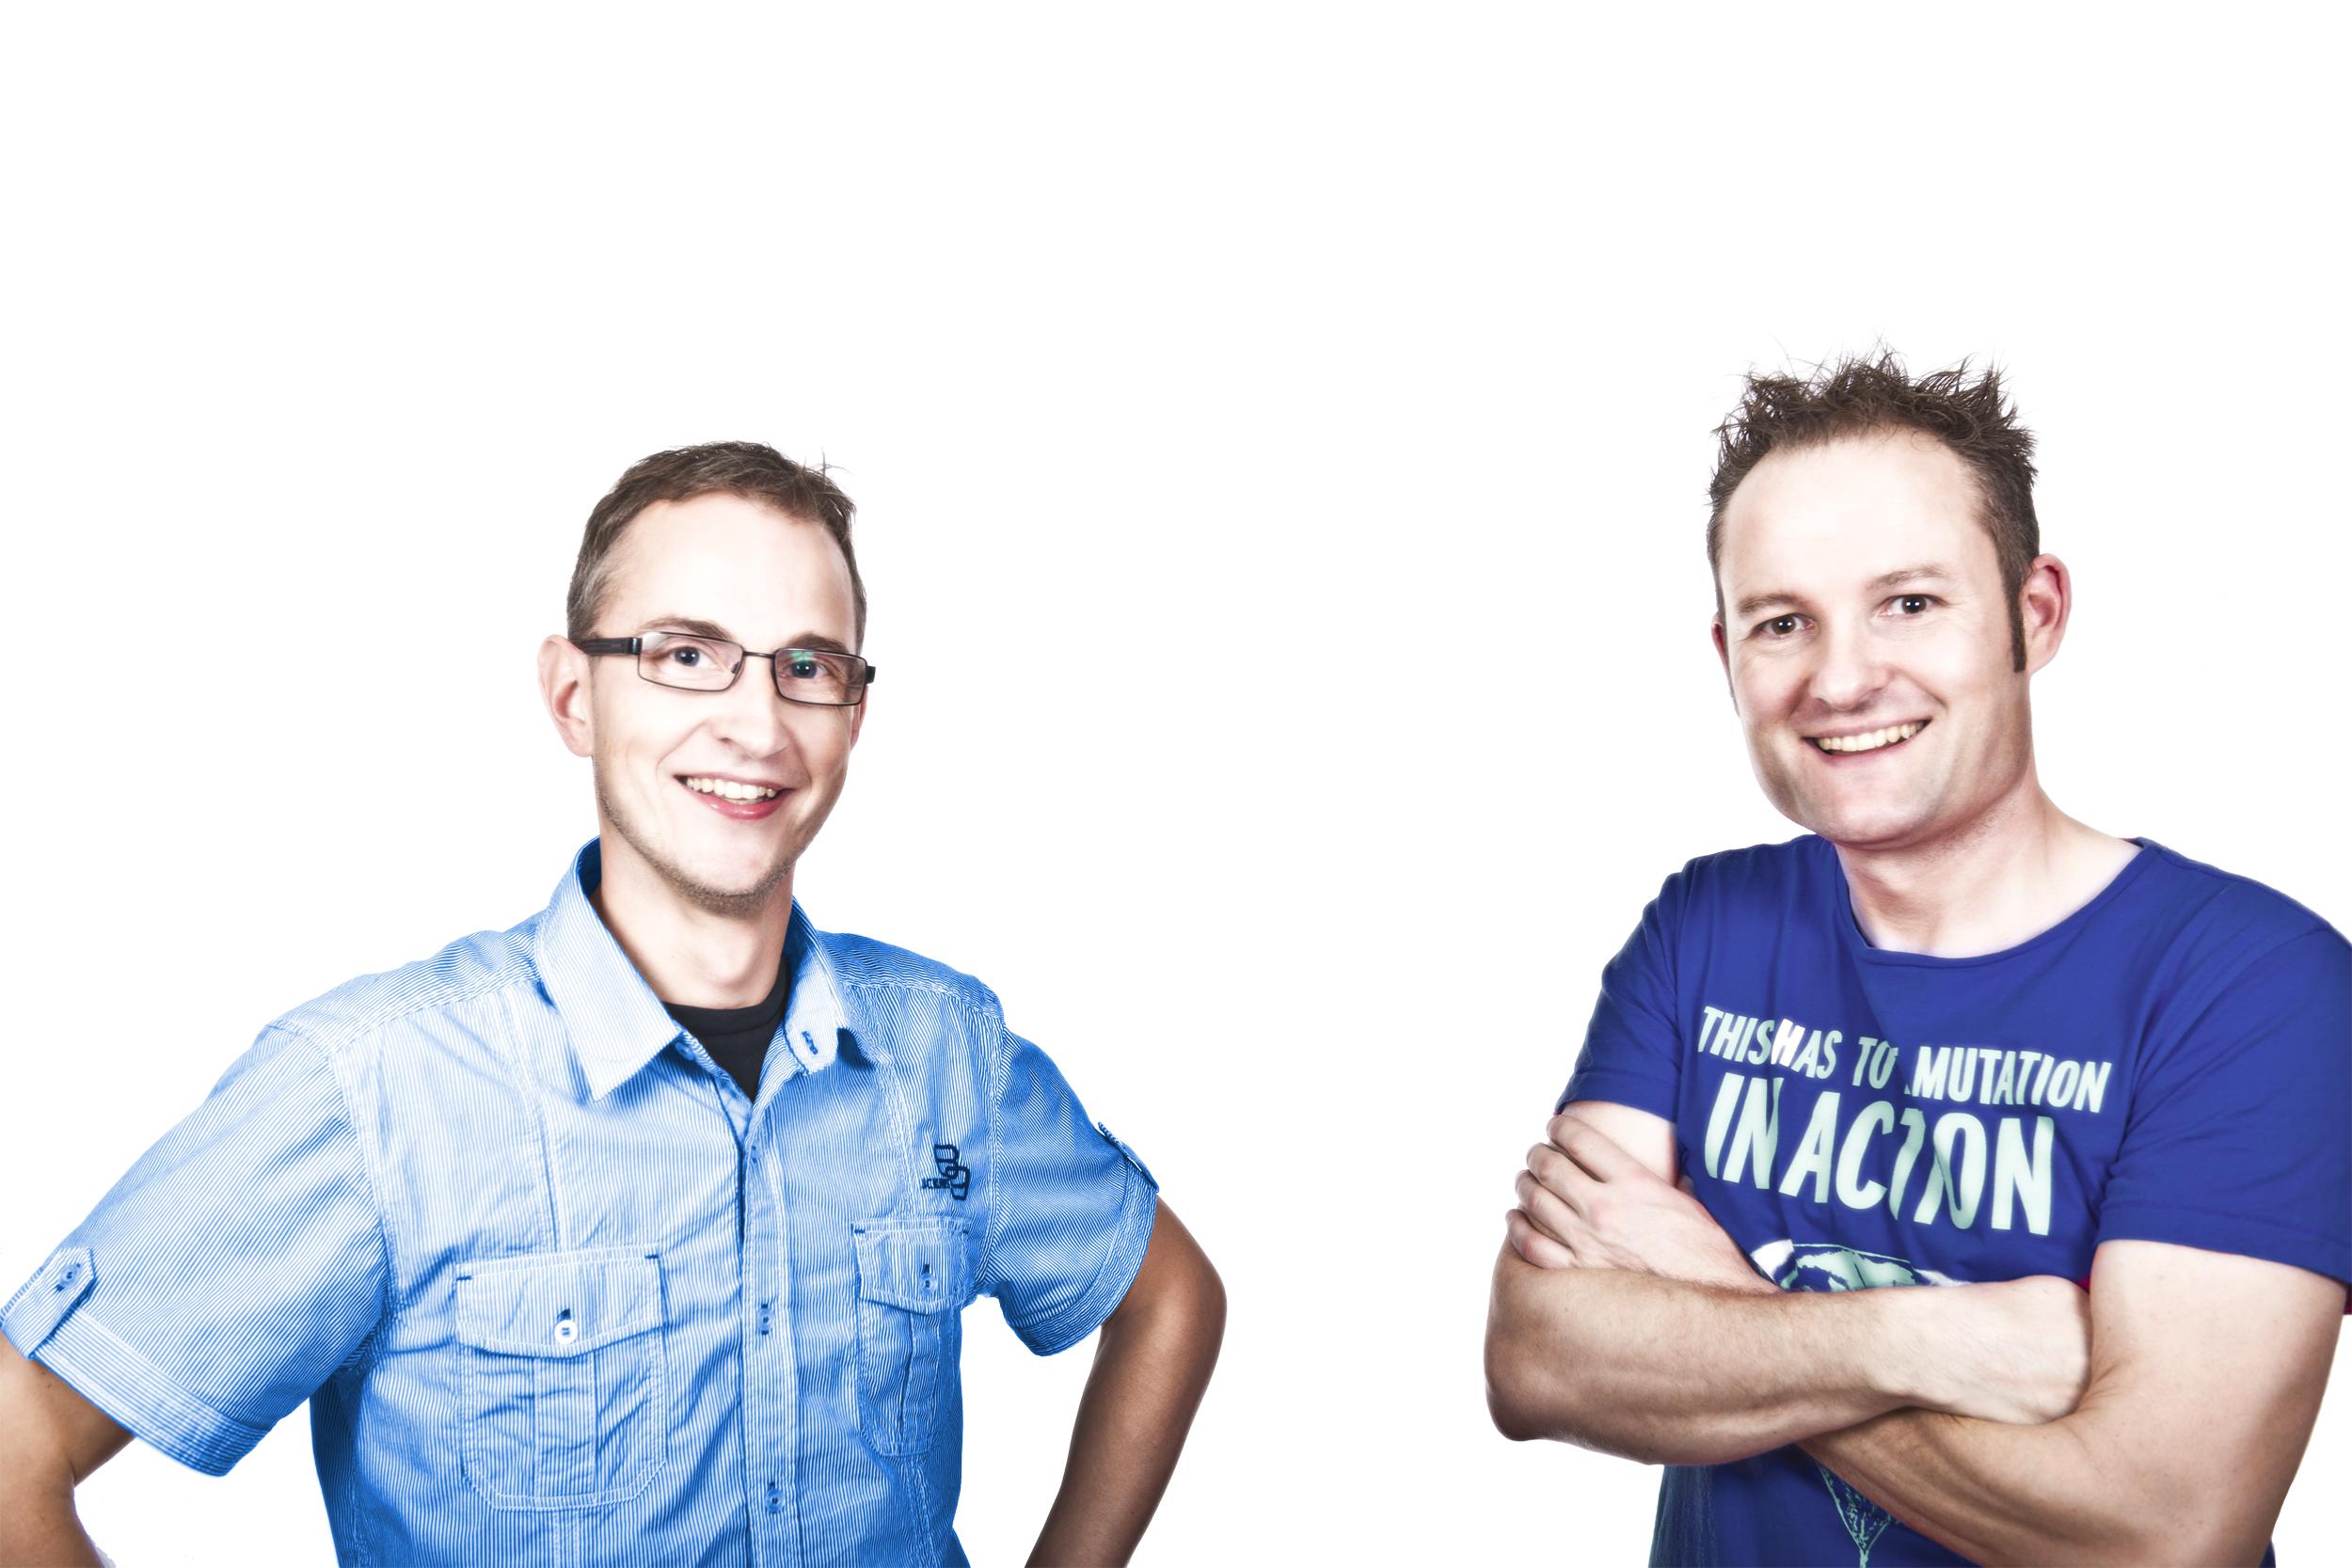 Jan Thulstrup & Esben Svenningsen